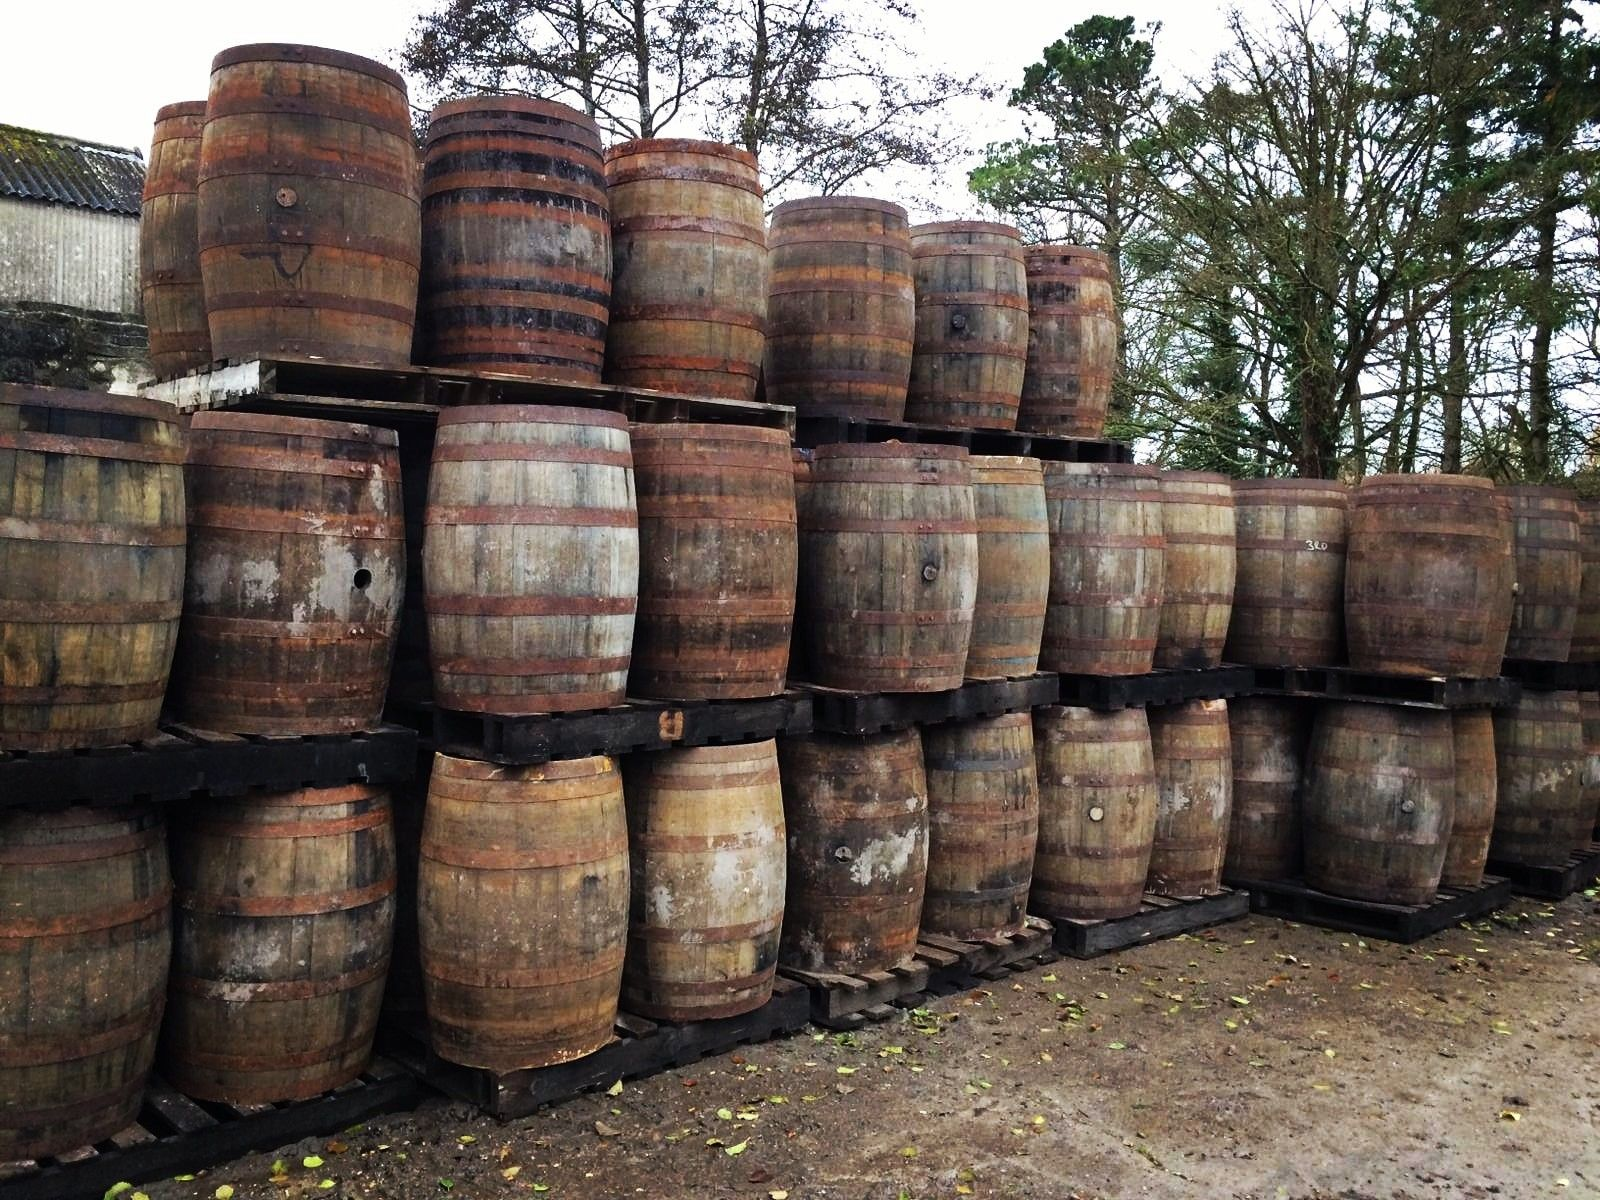 Eurosalve Com Kilkenny Architectural Salvage Antiques Ireland Architectural Salvage Barrels For Sale Whiskey Barrels For Sale